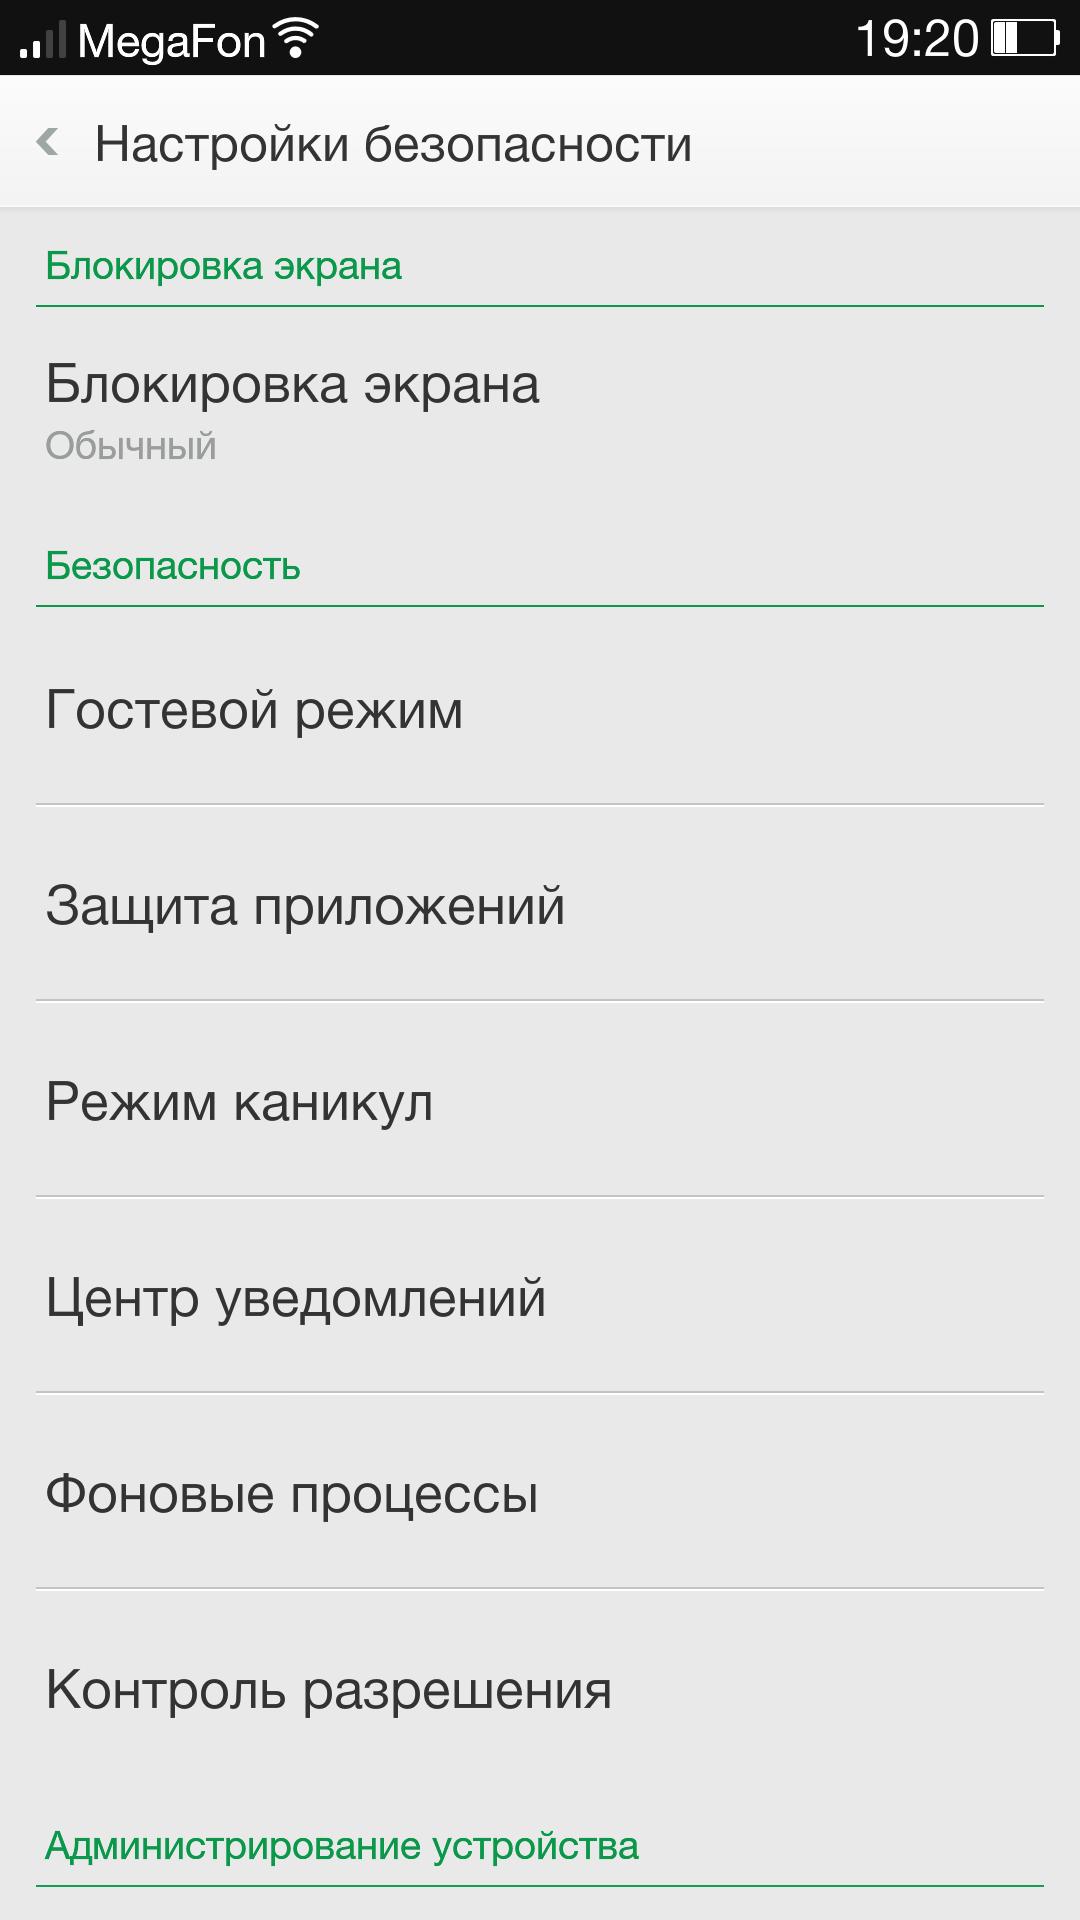 Screenshot_2013-10-26-19-20-19